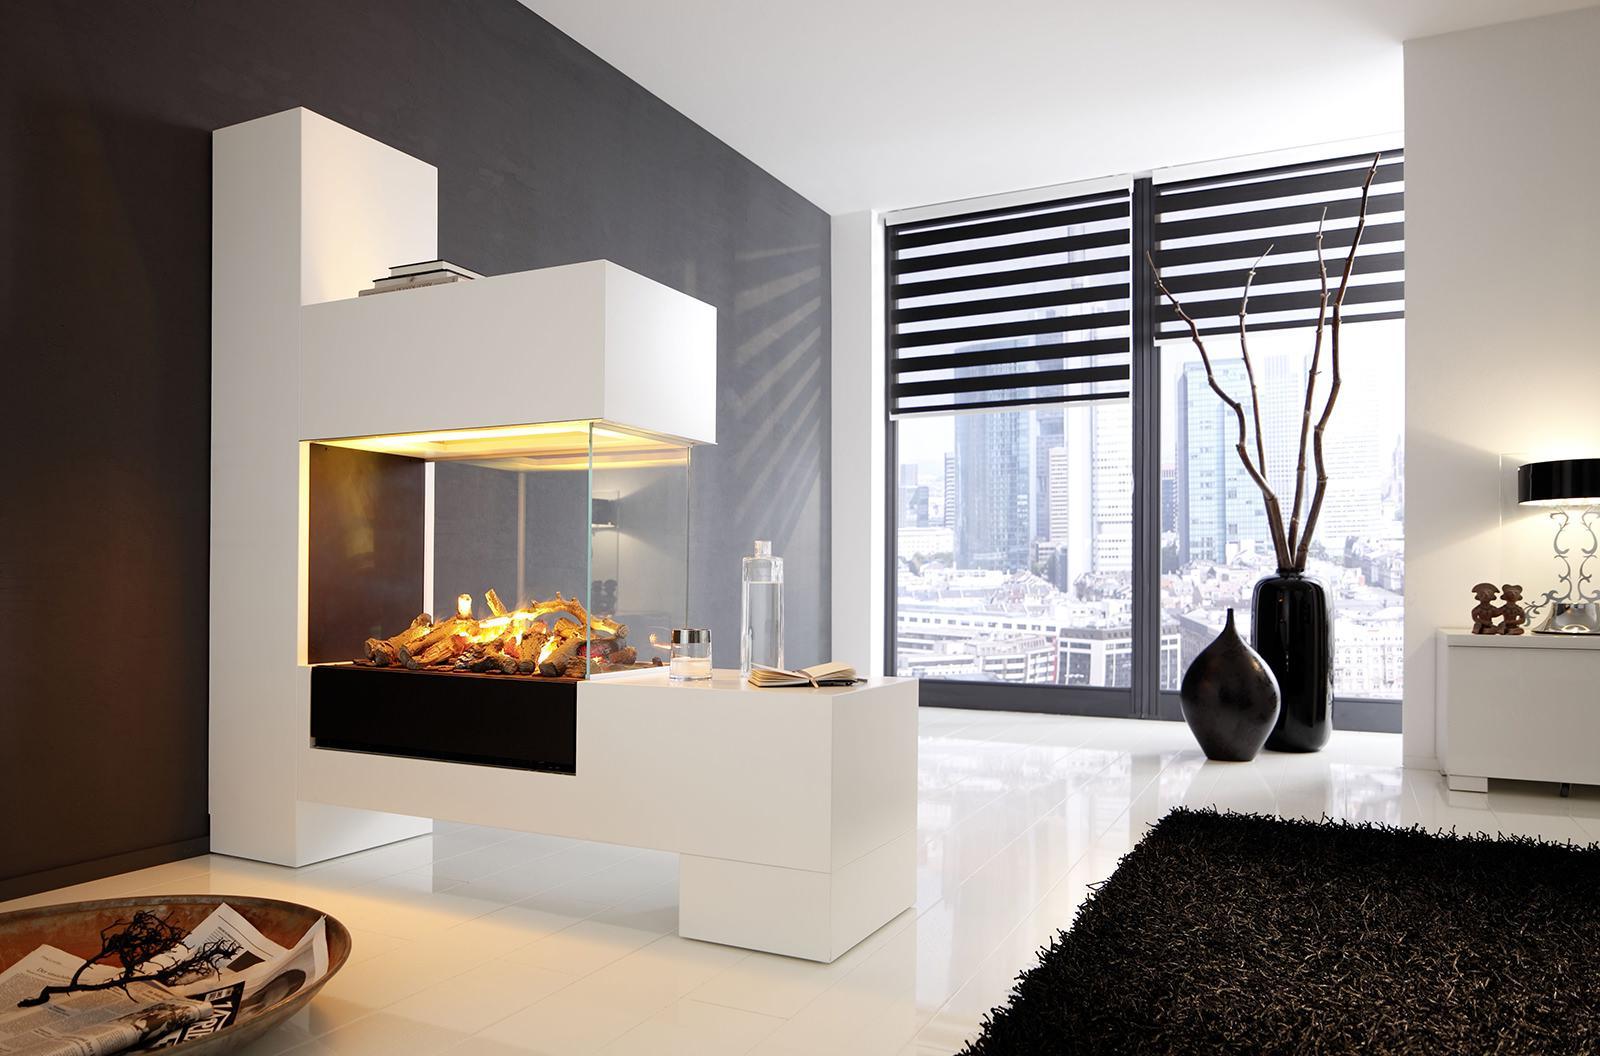 Large Vases For Living Room Decor